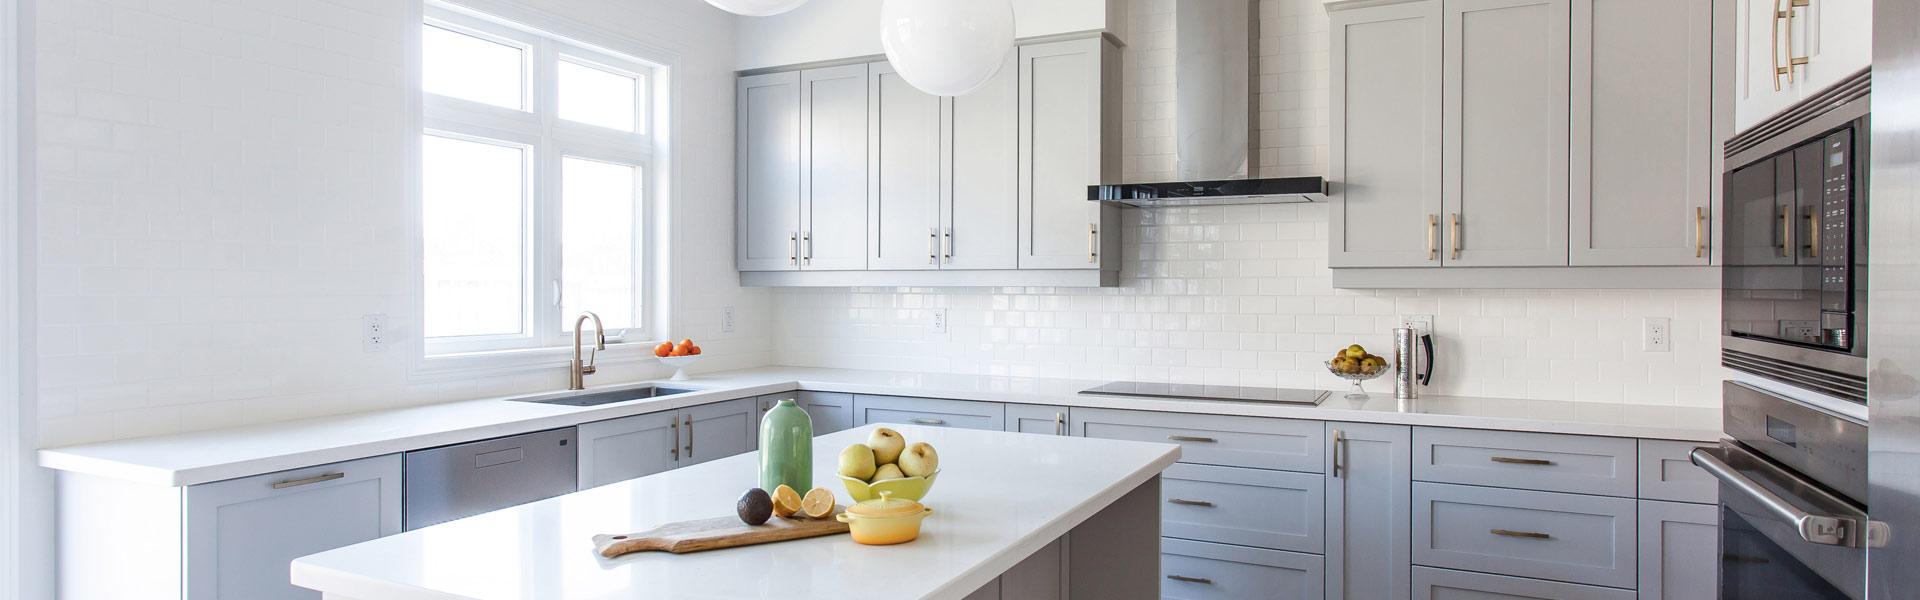 Affordable Kitchen Cabinets San Diego - Kitchen cabinets San ...